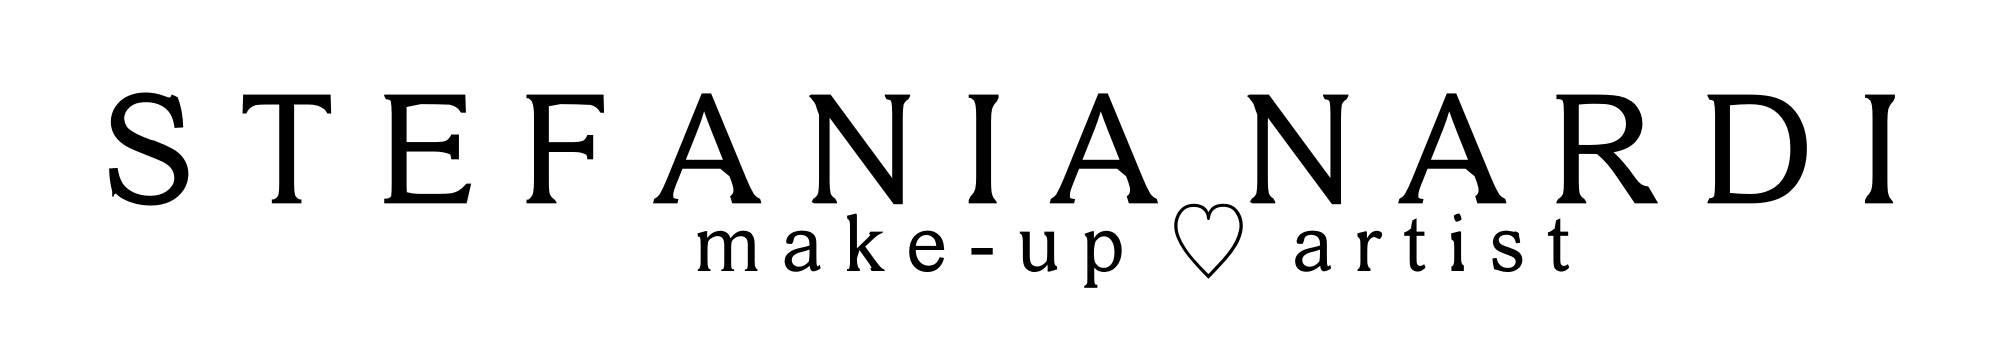 Stefania Nardi ♡ make-up artist